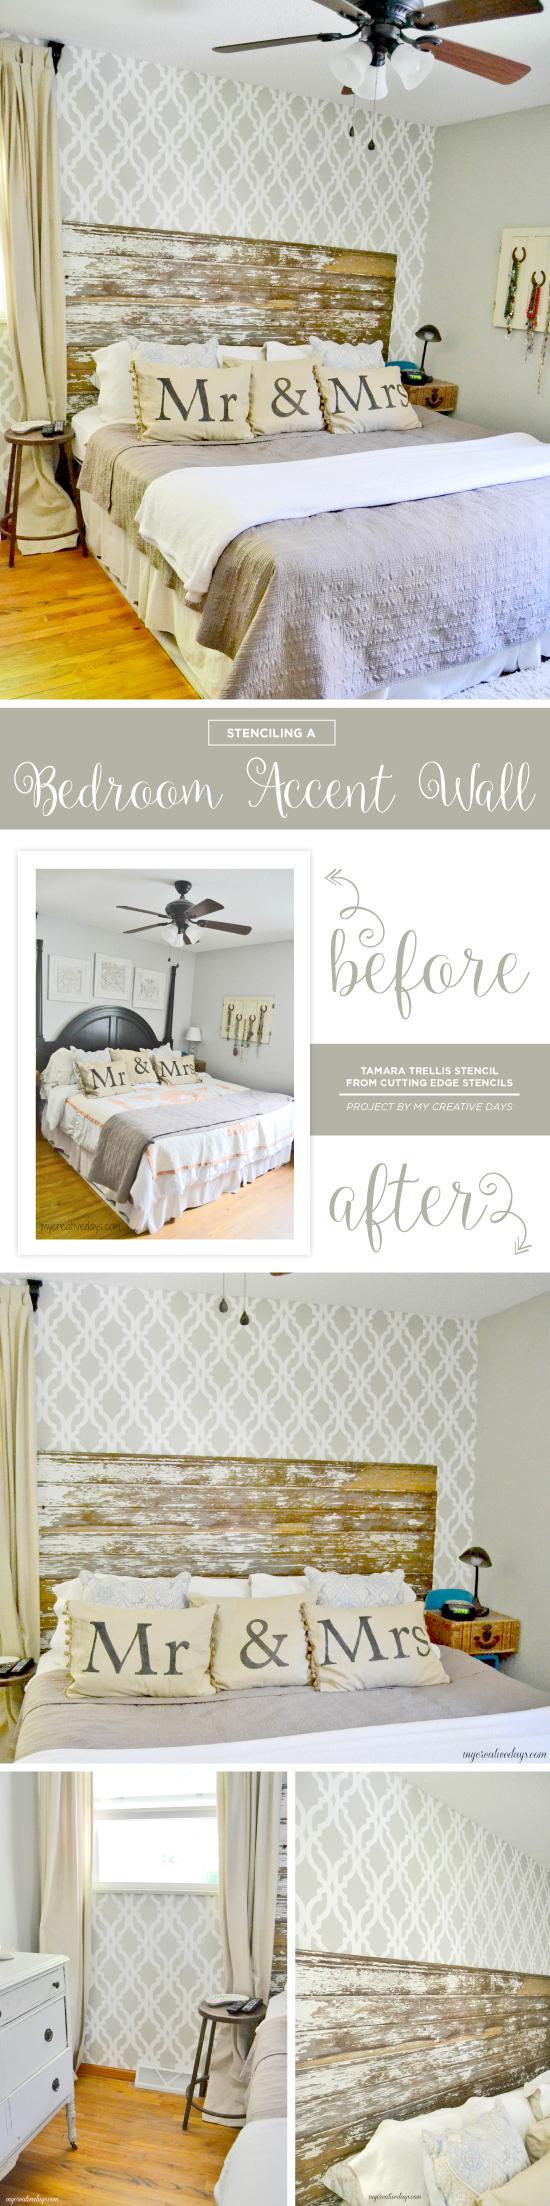 Cutting Edge Stencils shares a DIY stenciled accent wall in a bedroom using the Tamara Trellis Allover pattern. http://www.cuttingedgestencils.com/tamara-trellis-allover-wall-stencils.html